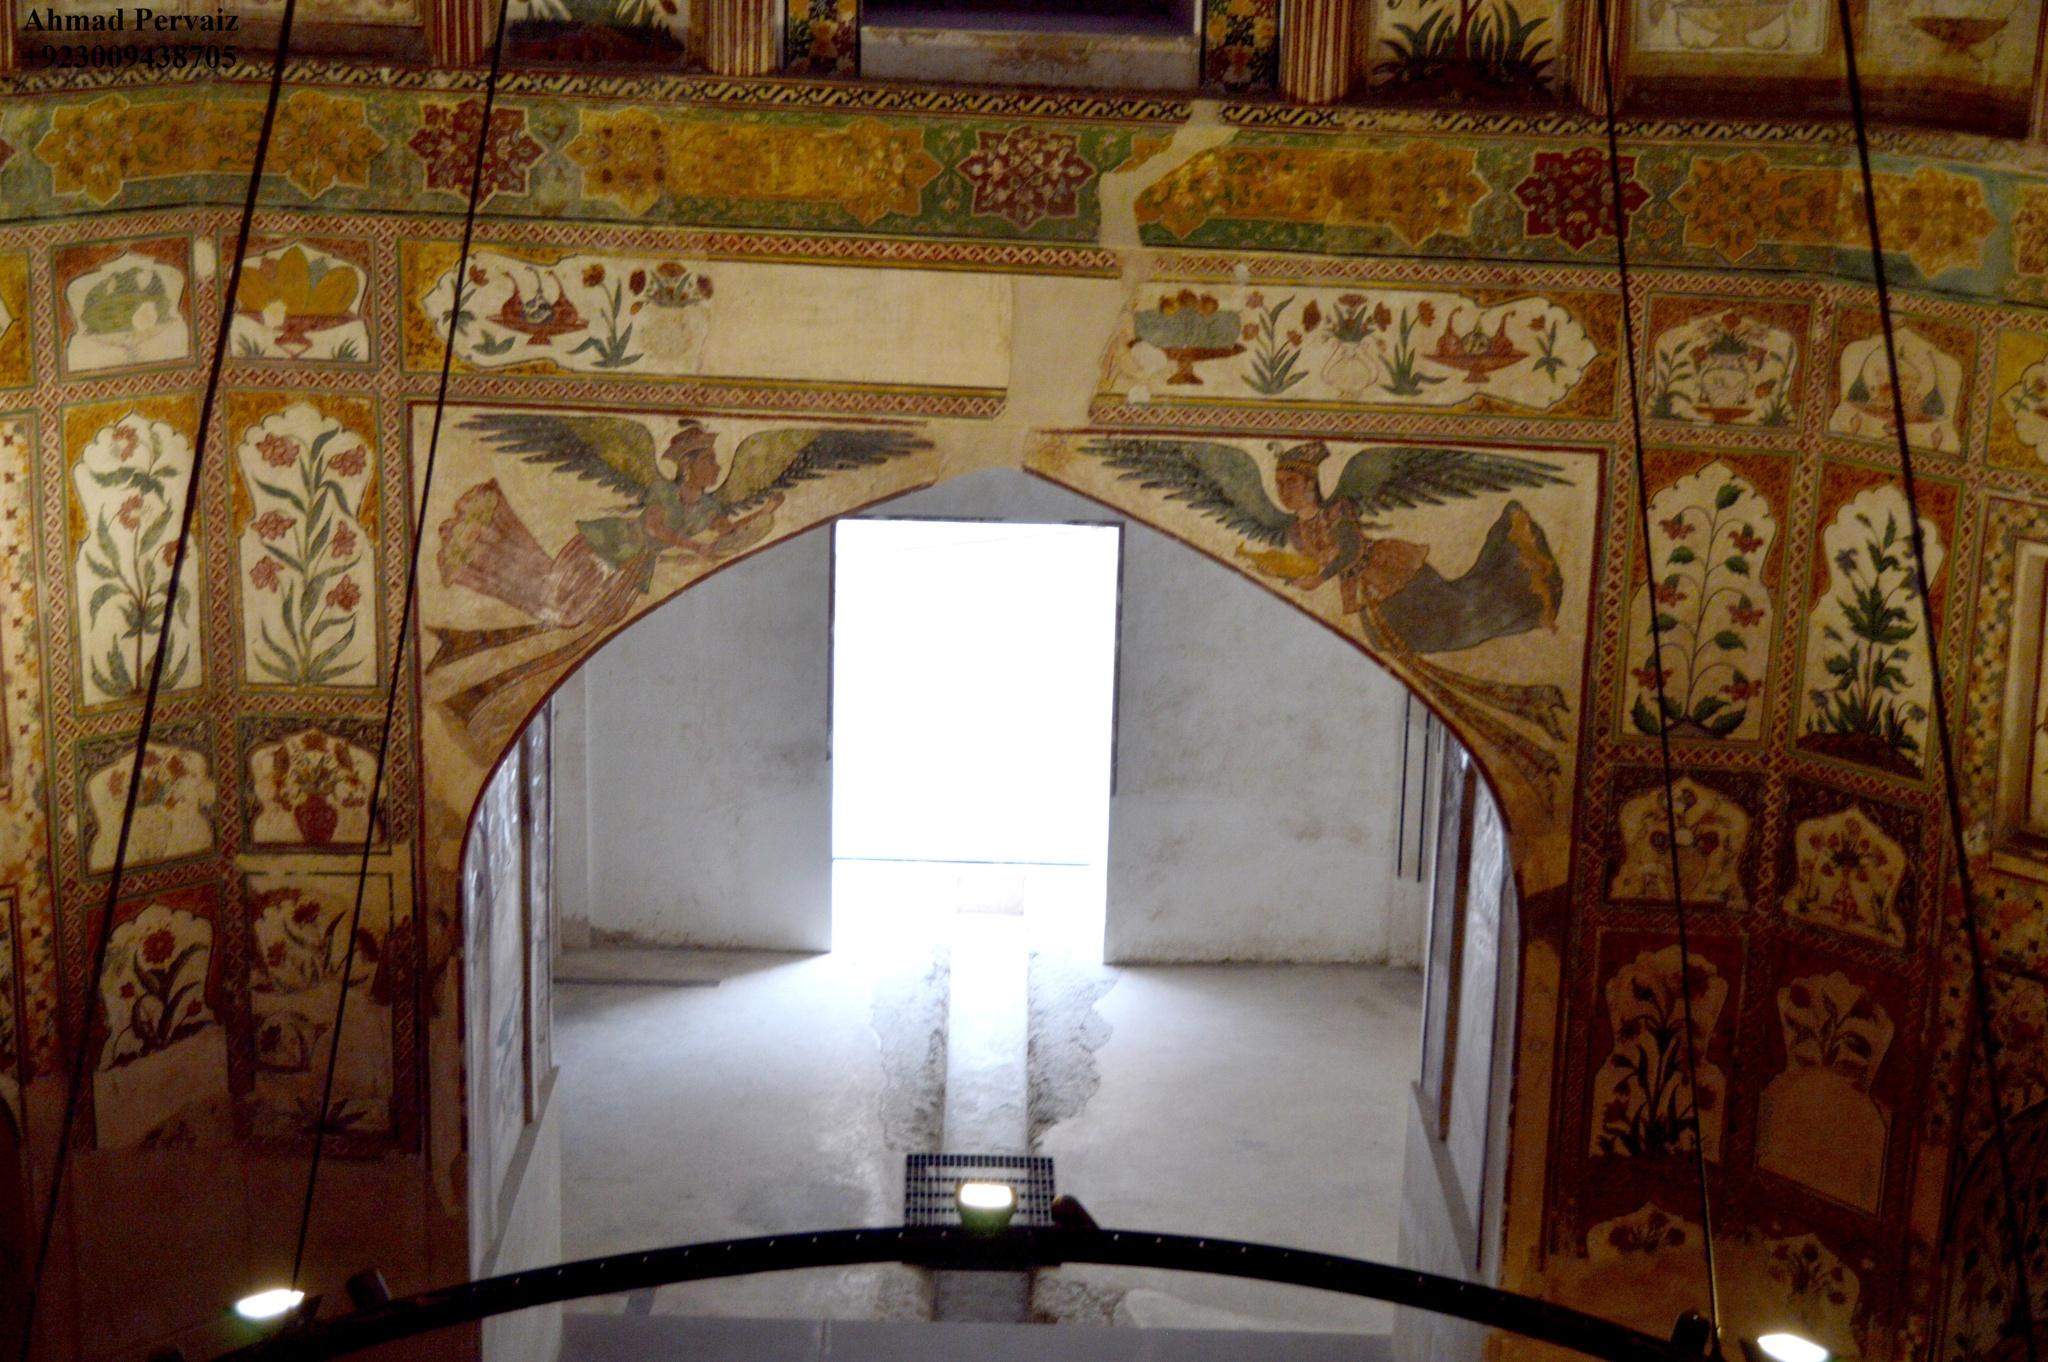 Entrance to Main Hall. by pervaiz_jiu-jitsu